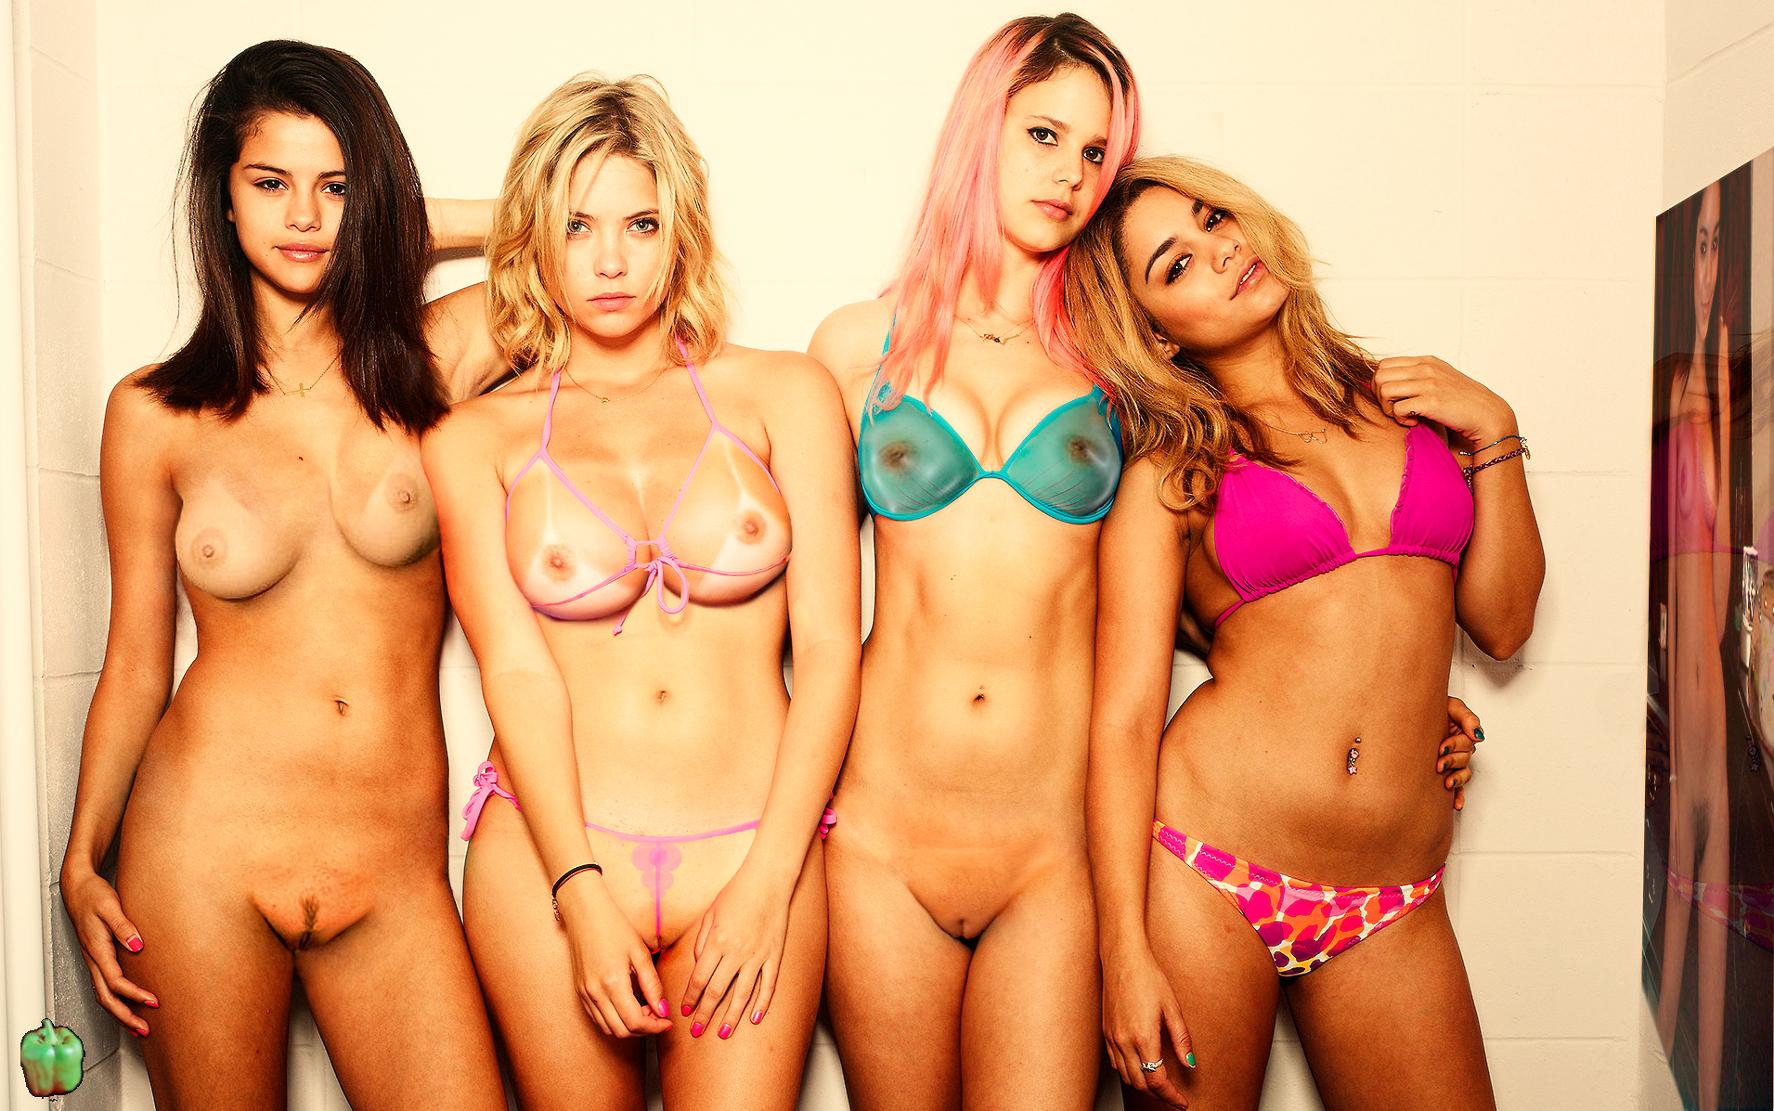 Vanessa Hudgens And Ashley Tisdale Porn Sex Tape